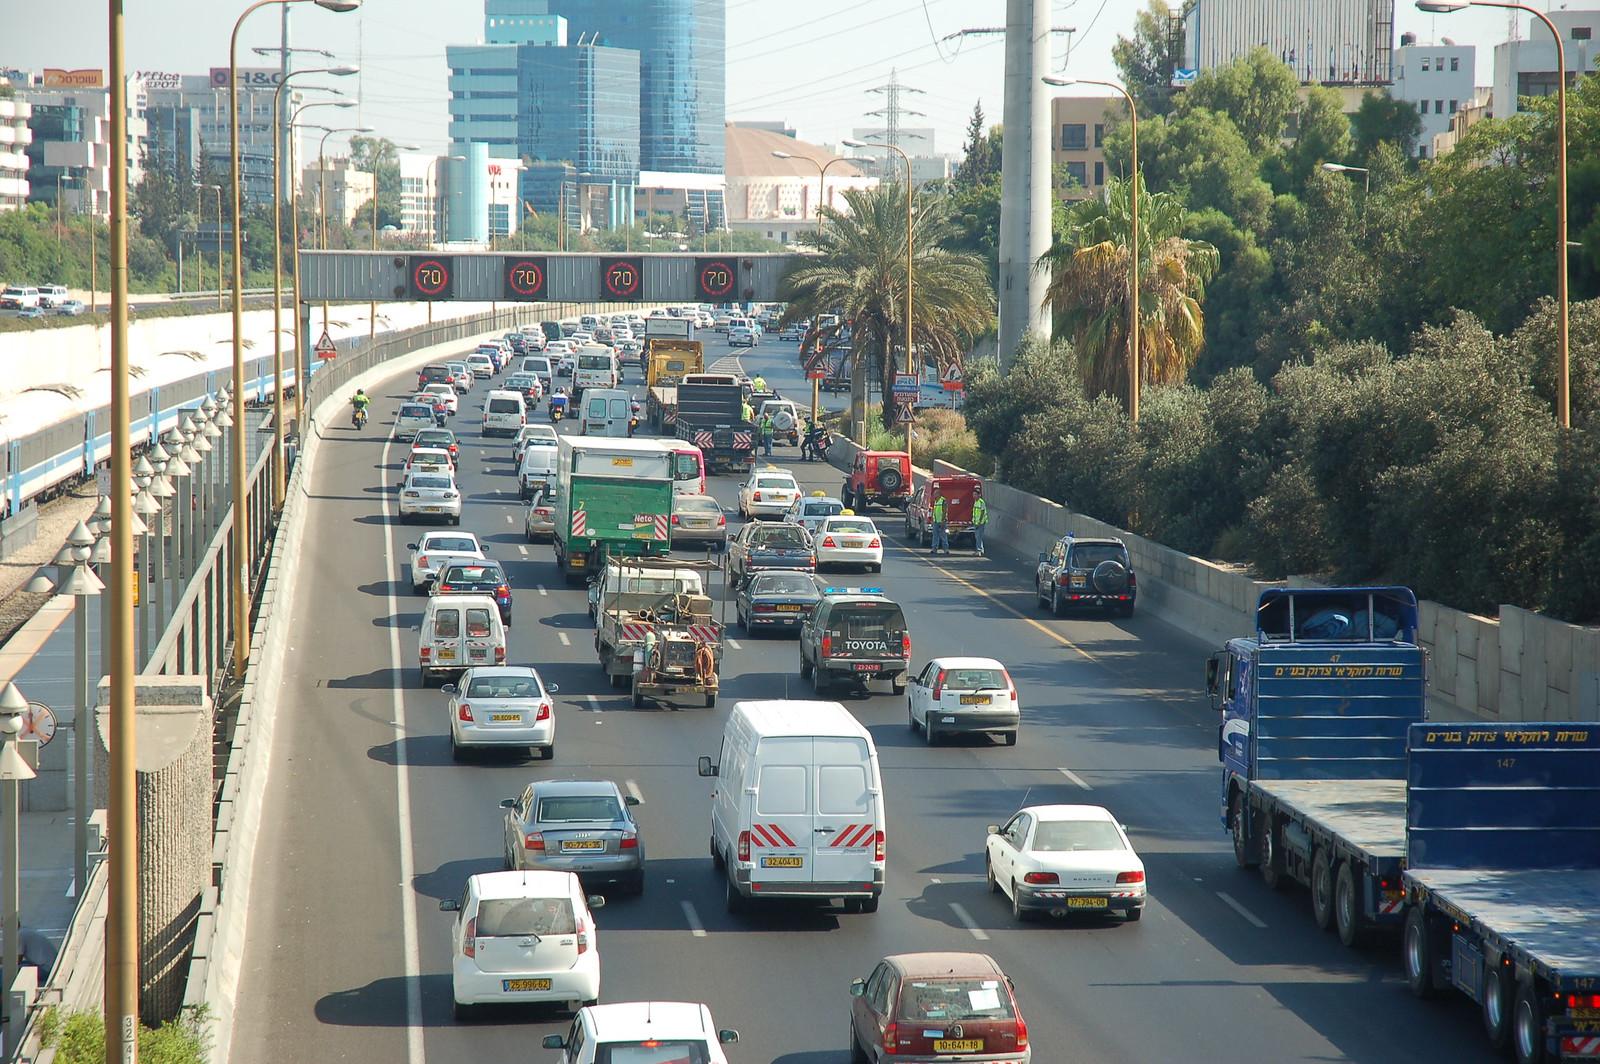 Protesting Fuel Prices in Tel Aviv Israel